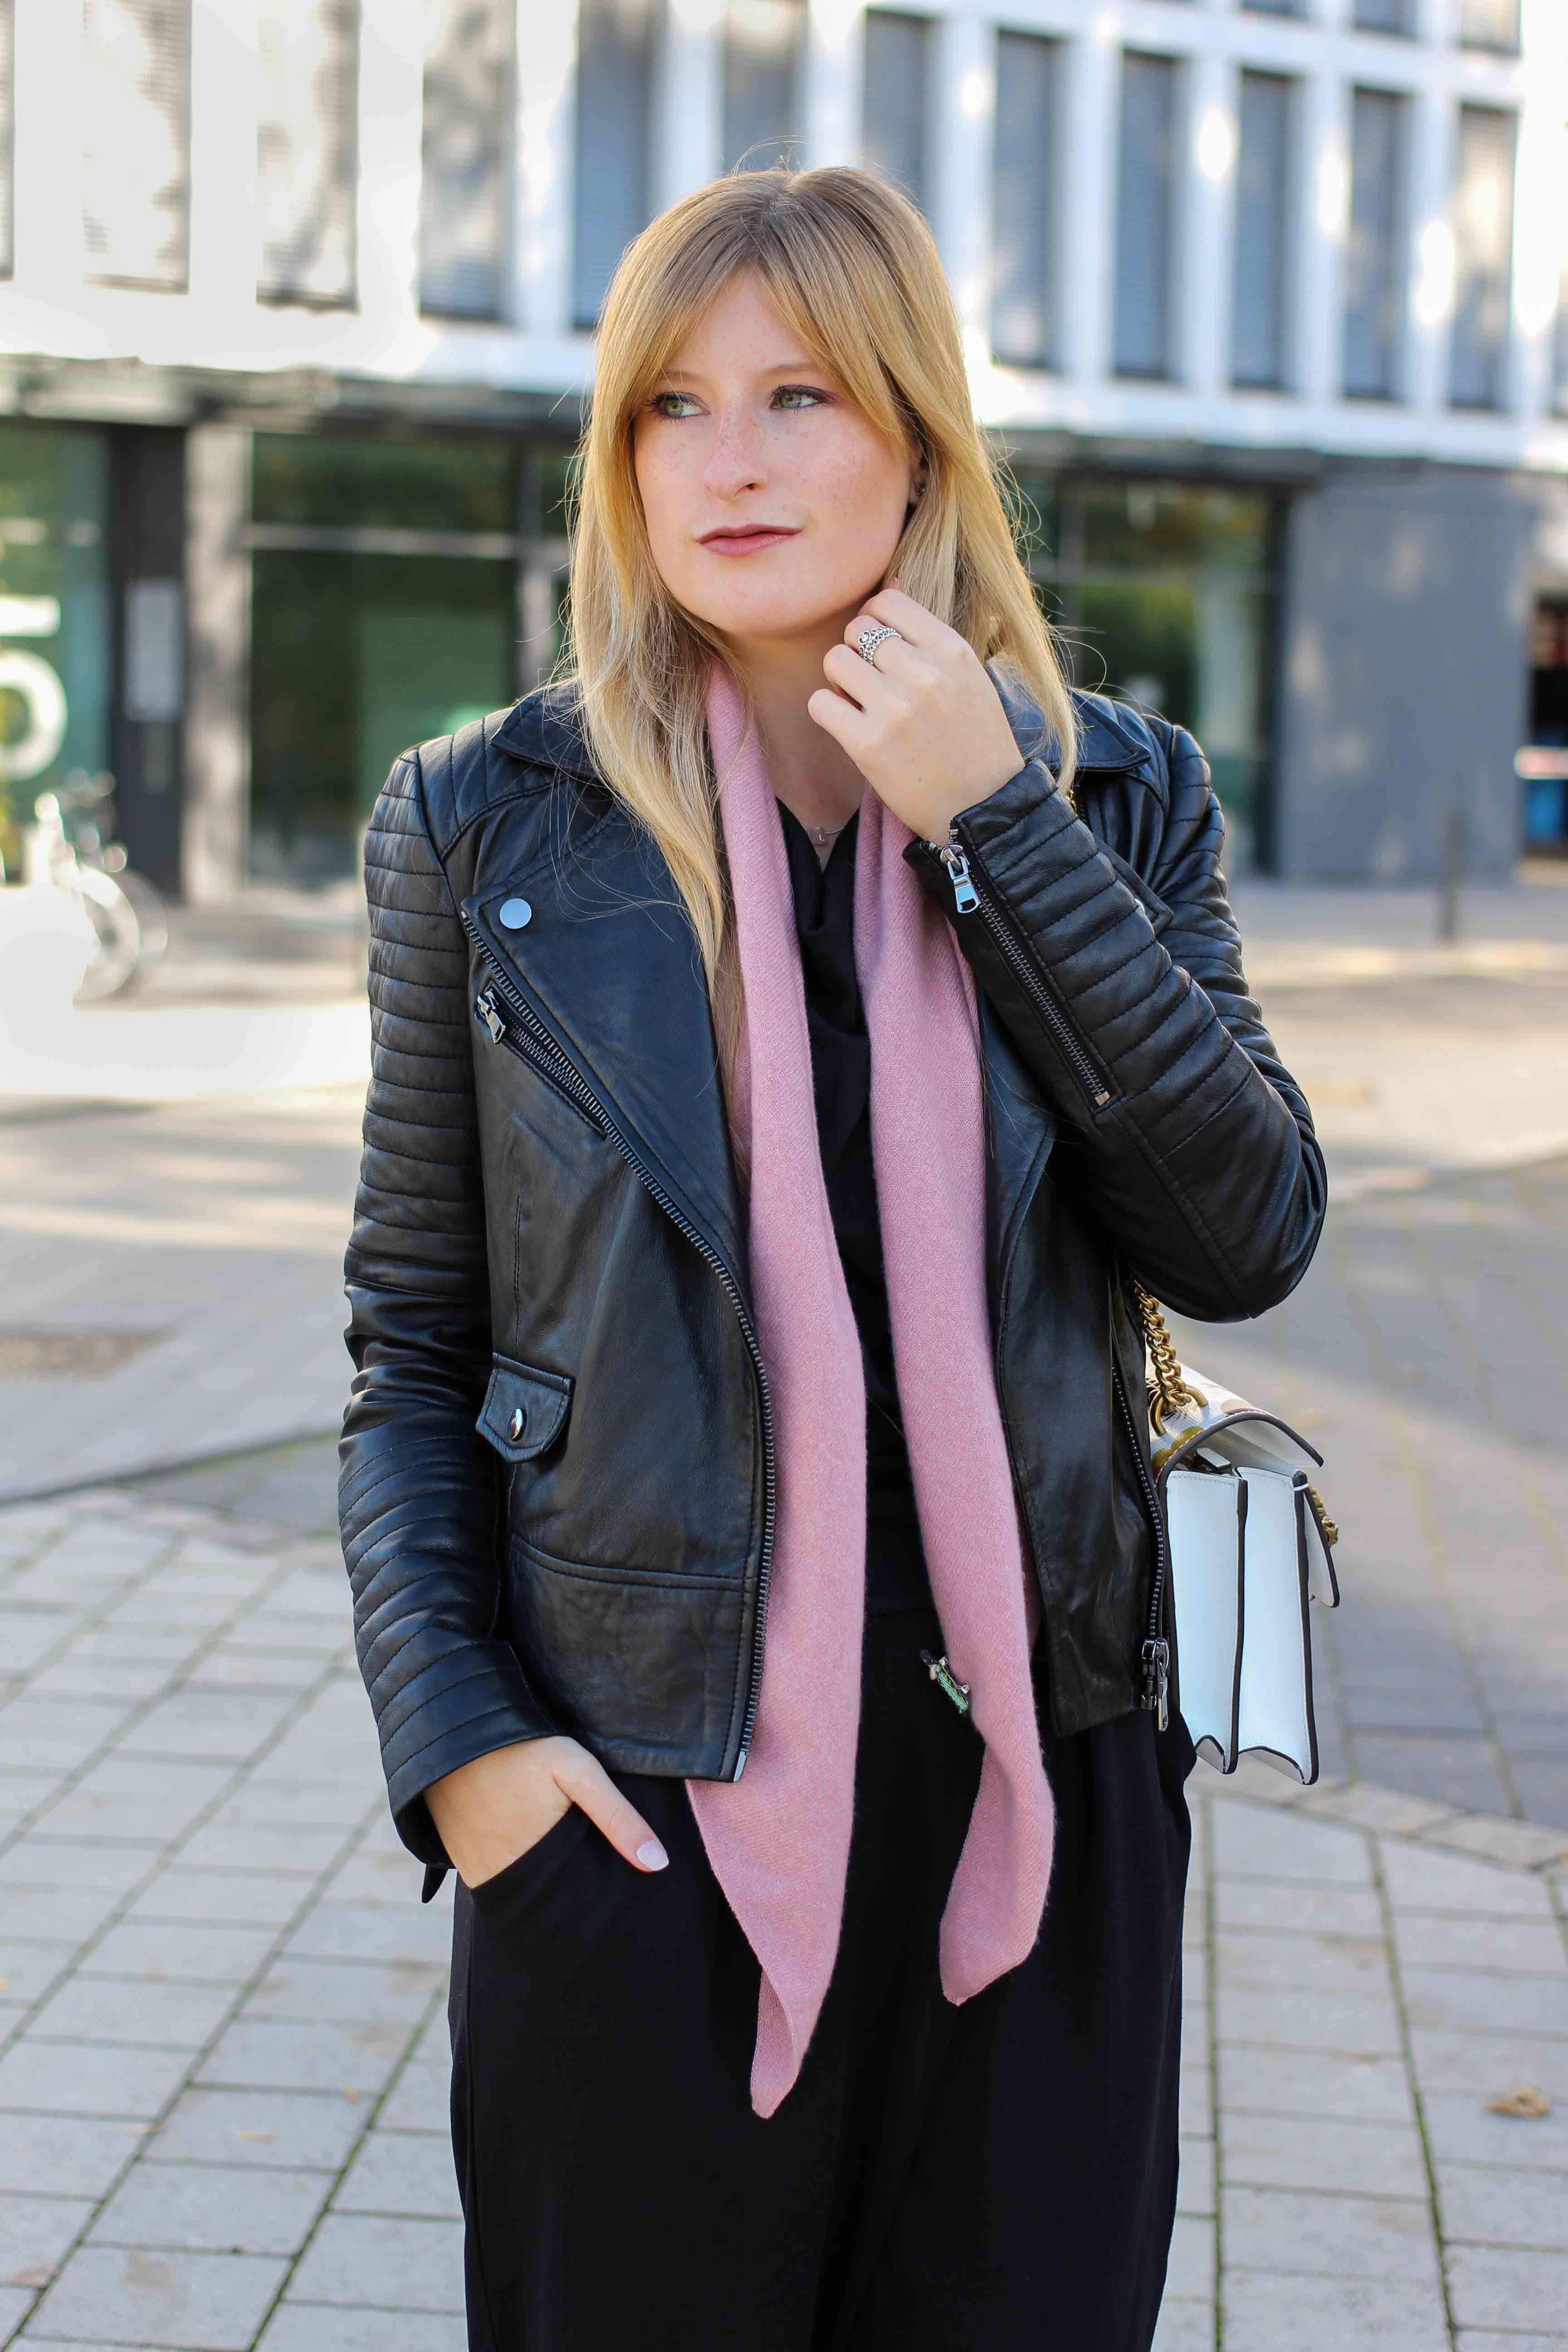 Schwarzer Jumpsuit rosa Kaschmir Schal Fashionsparkle Sparkle Store Lederjacke Modeblog 92